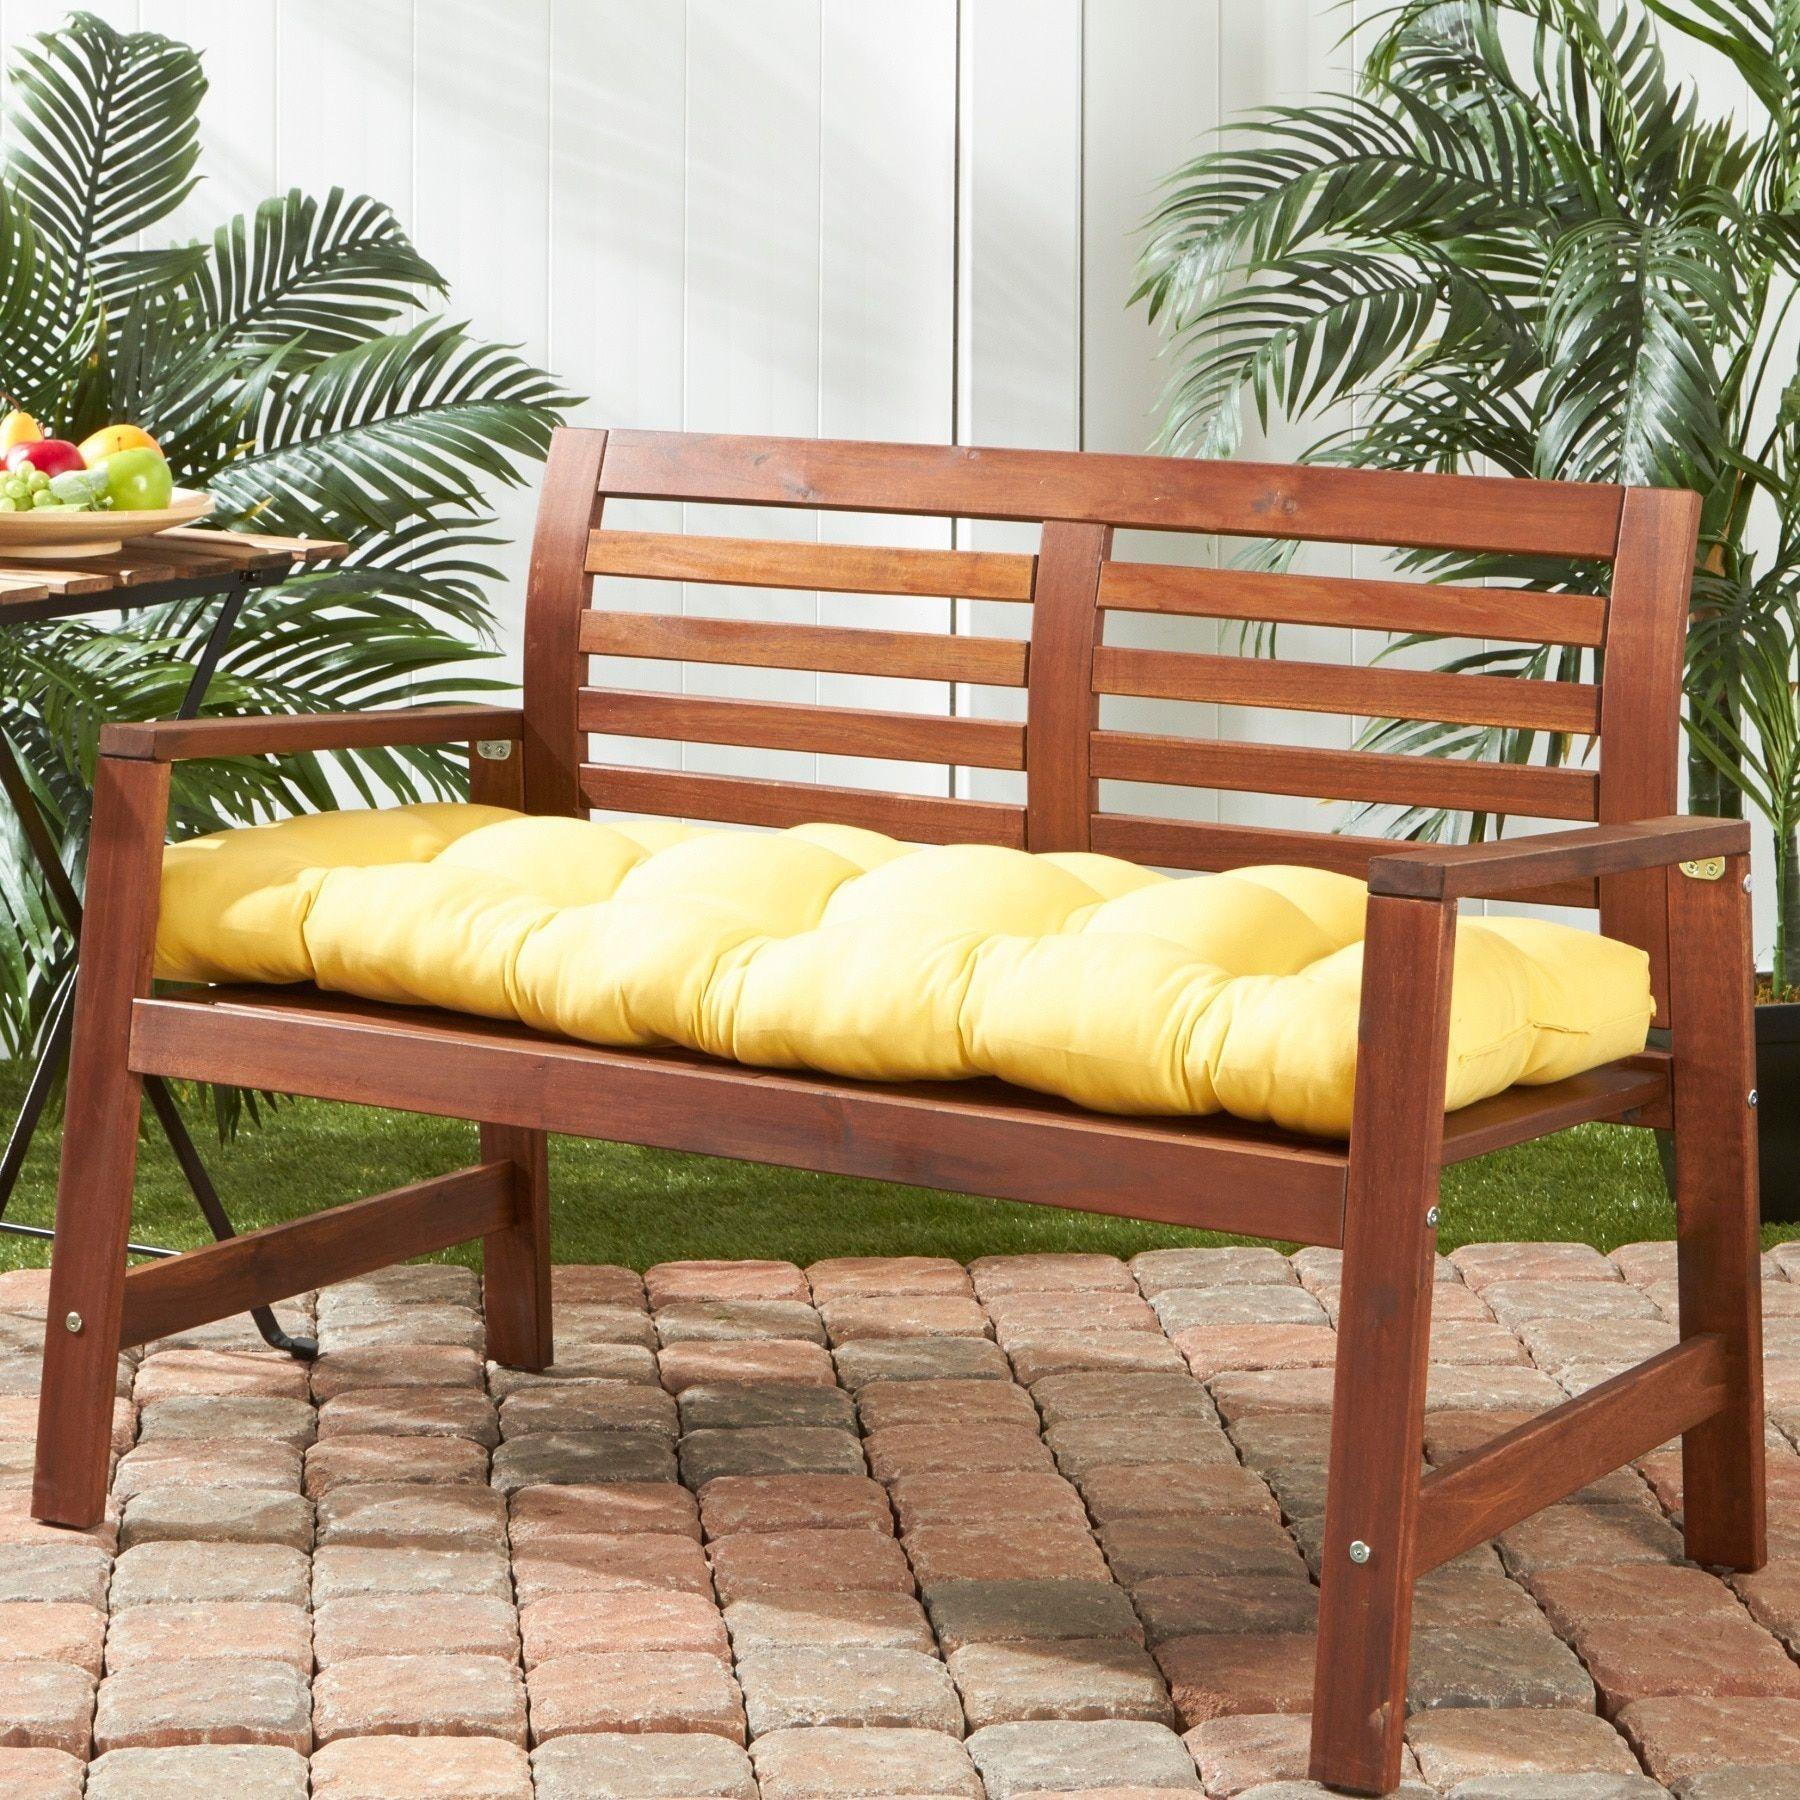 51 Inch Outdoor Sunbeam Bench Cushion Suncrest Yellow Plastic